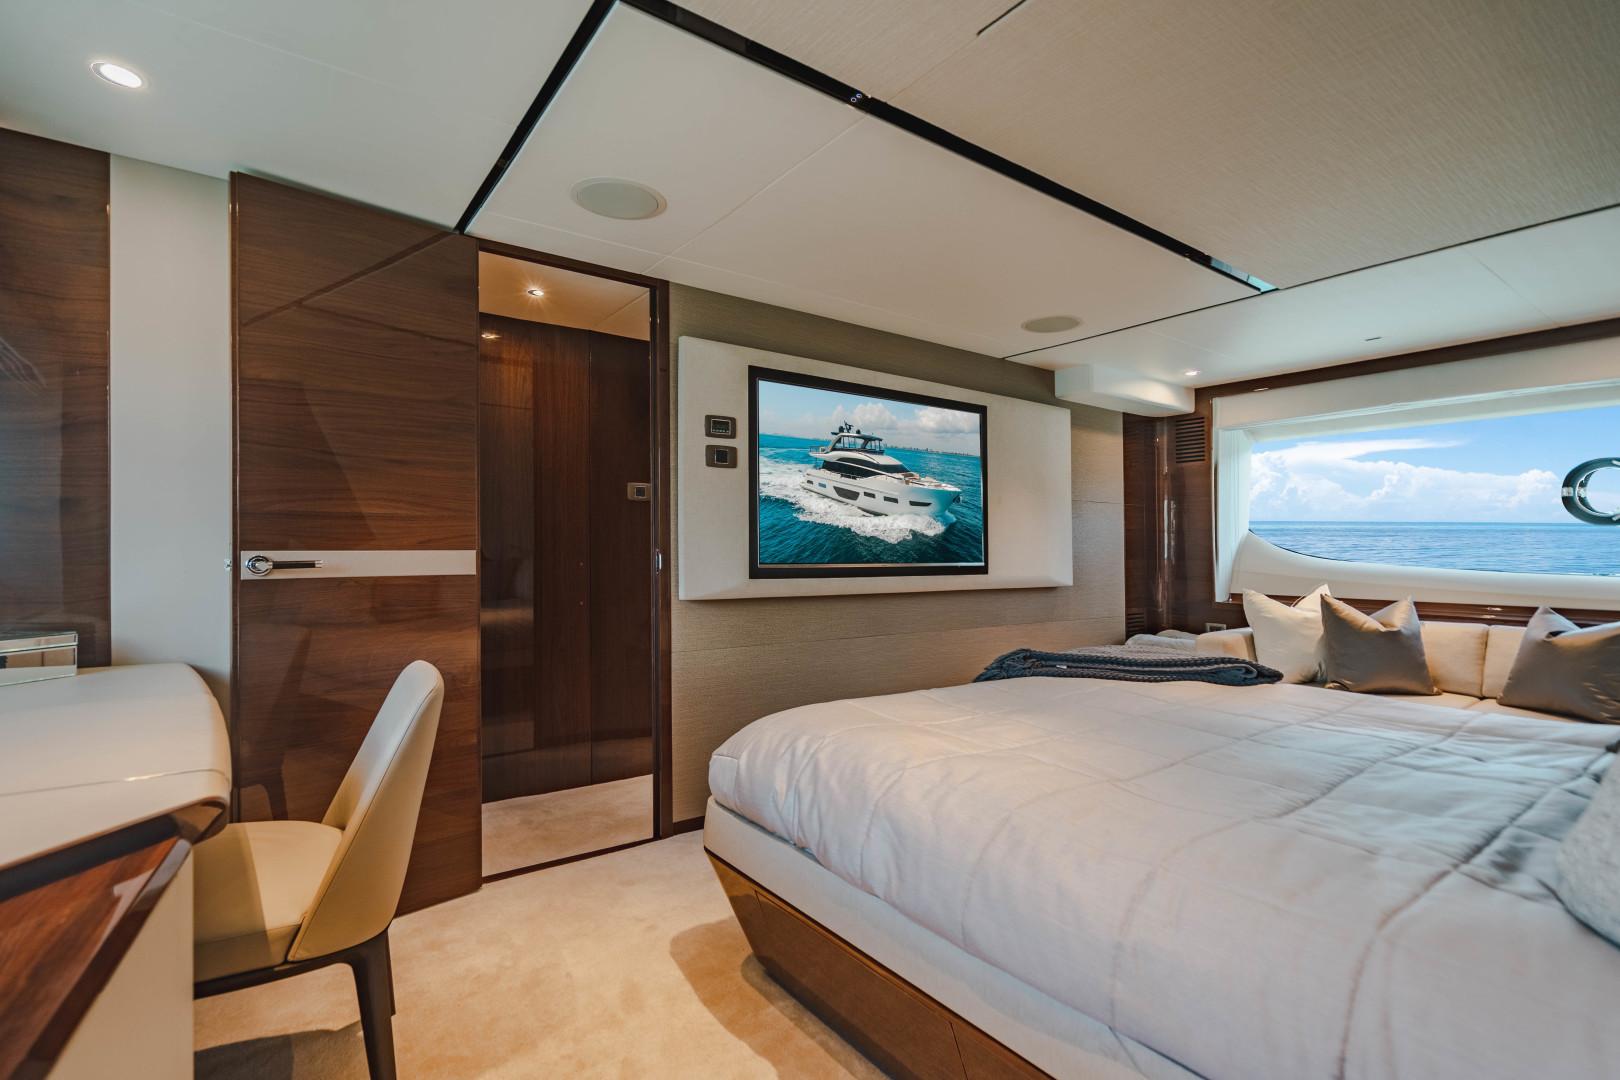 Princess-Y85  2019-Splash Delray Beach-Florida-United States-1631680 | Thumbnail